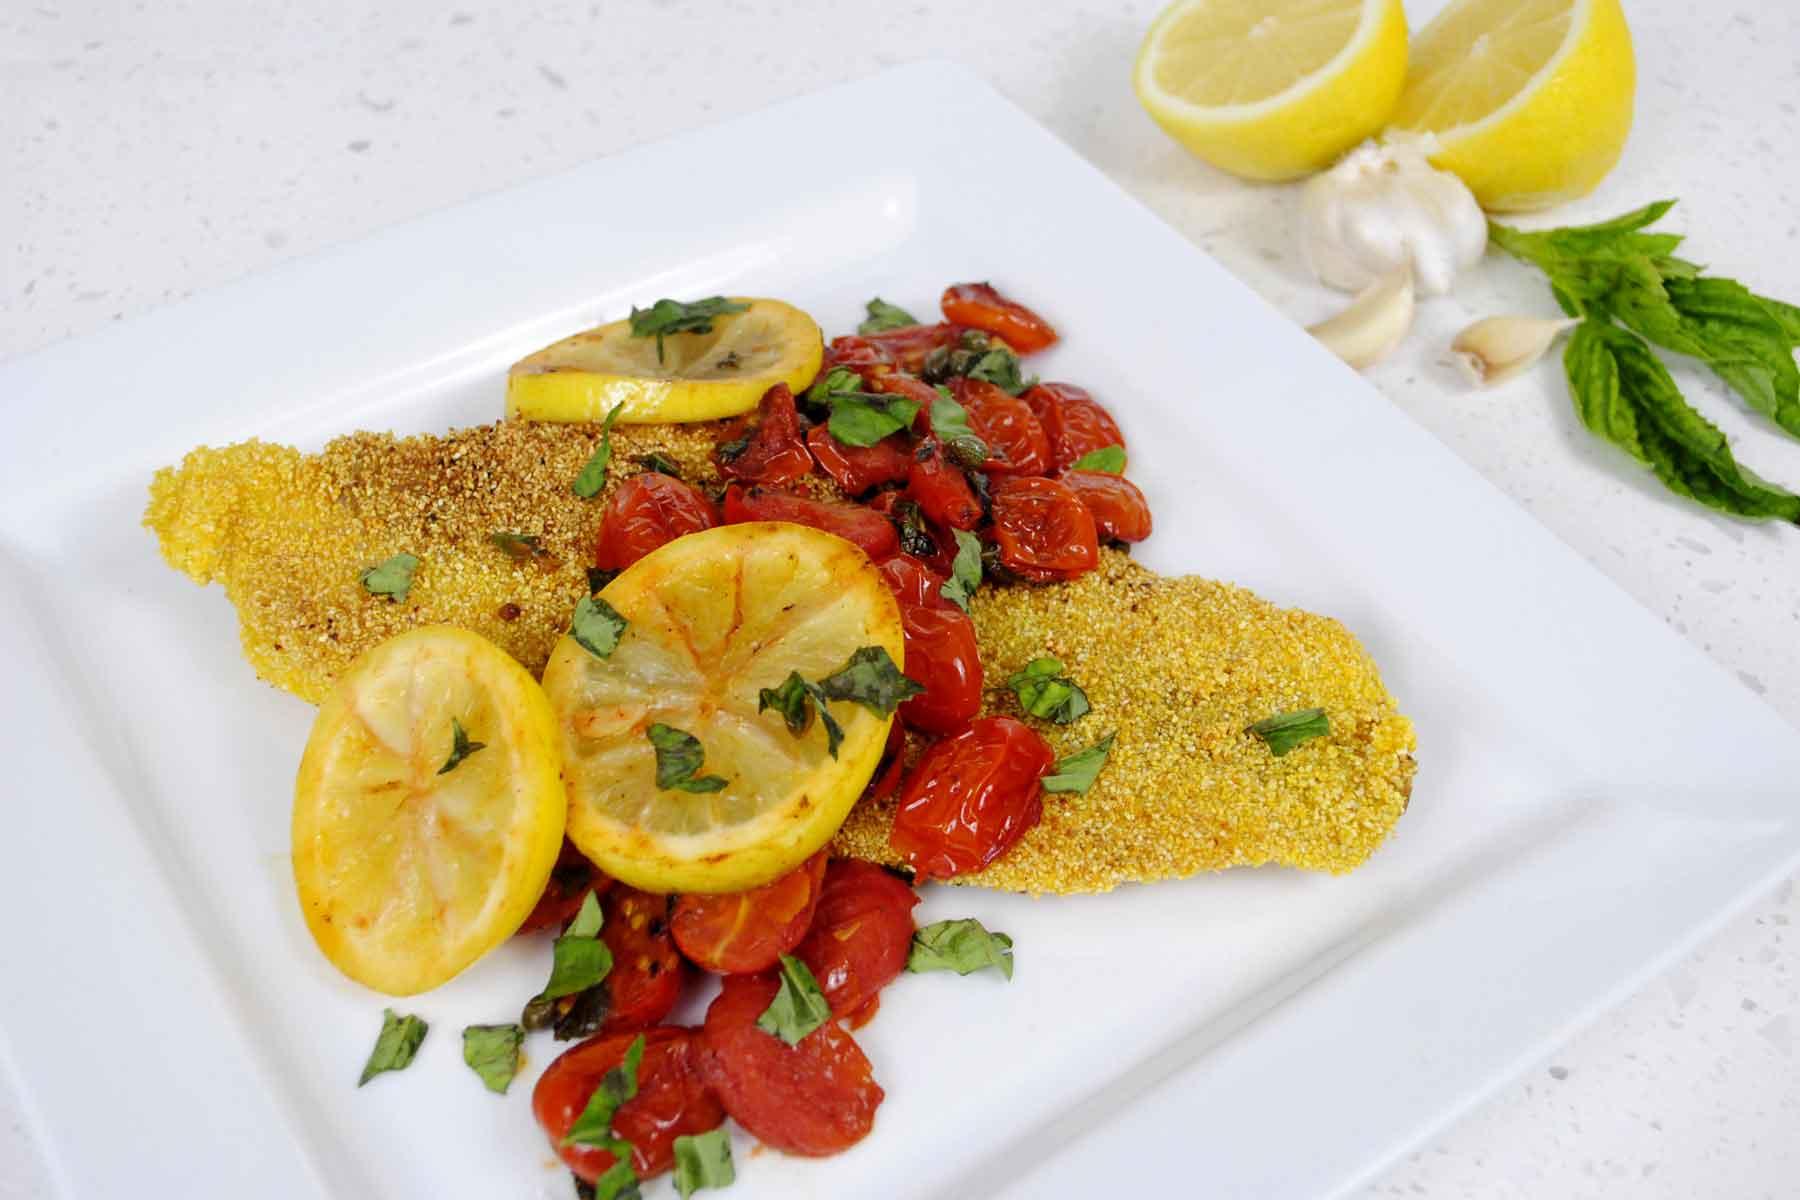 Grits-Crusted Catfish with Tomatoes, Basil & Lemon